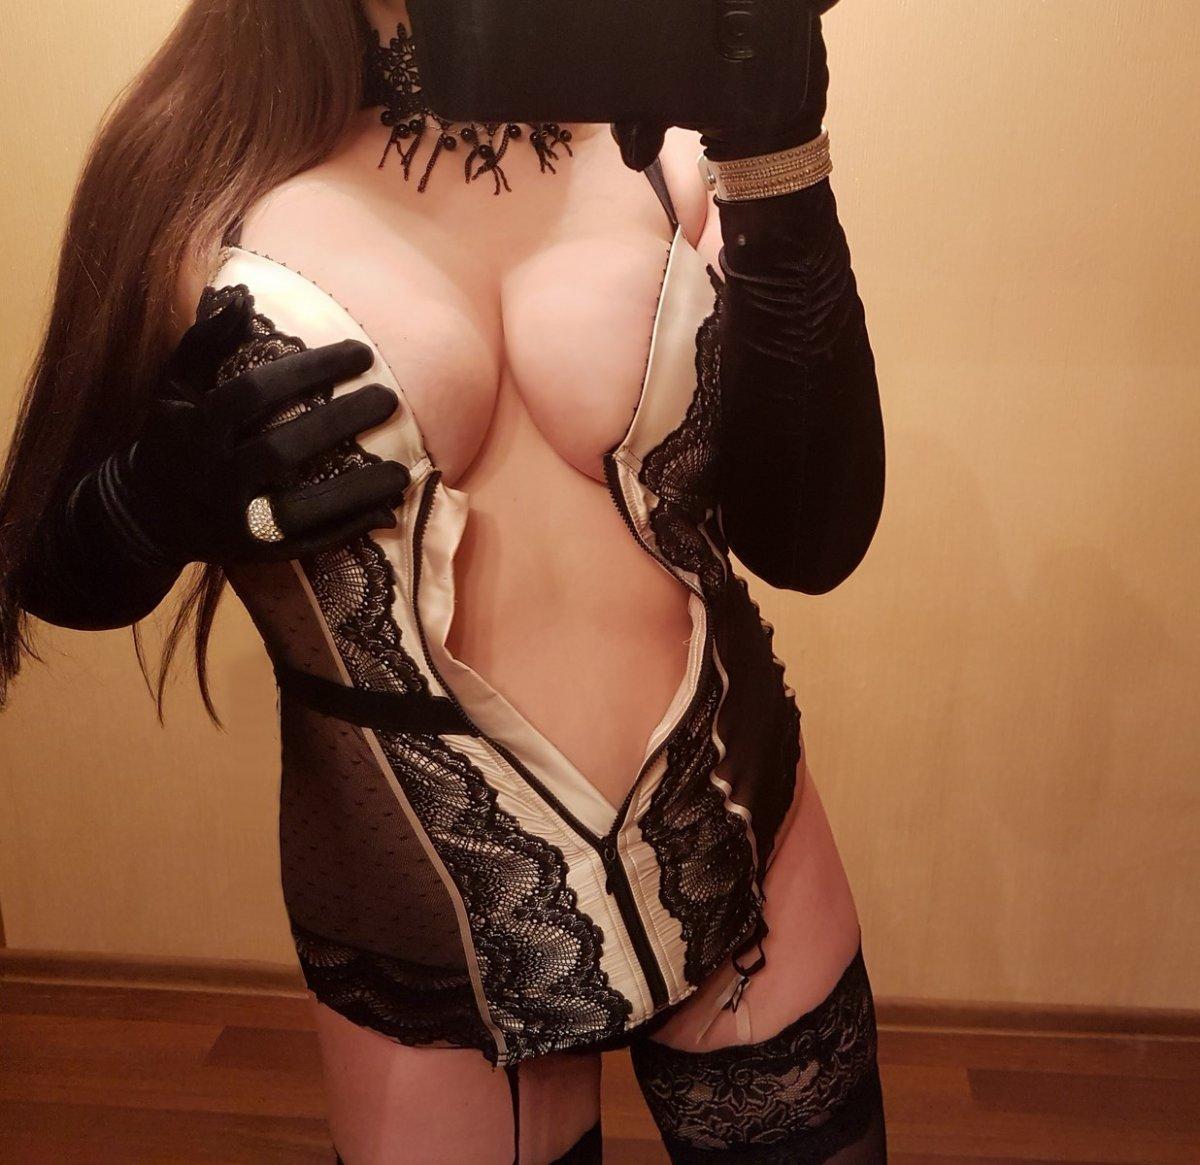 В тамбове вконтакте проститутка